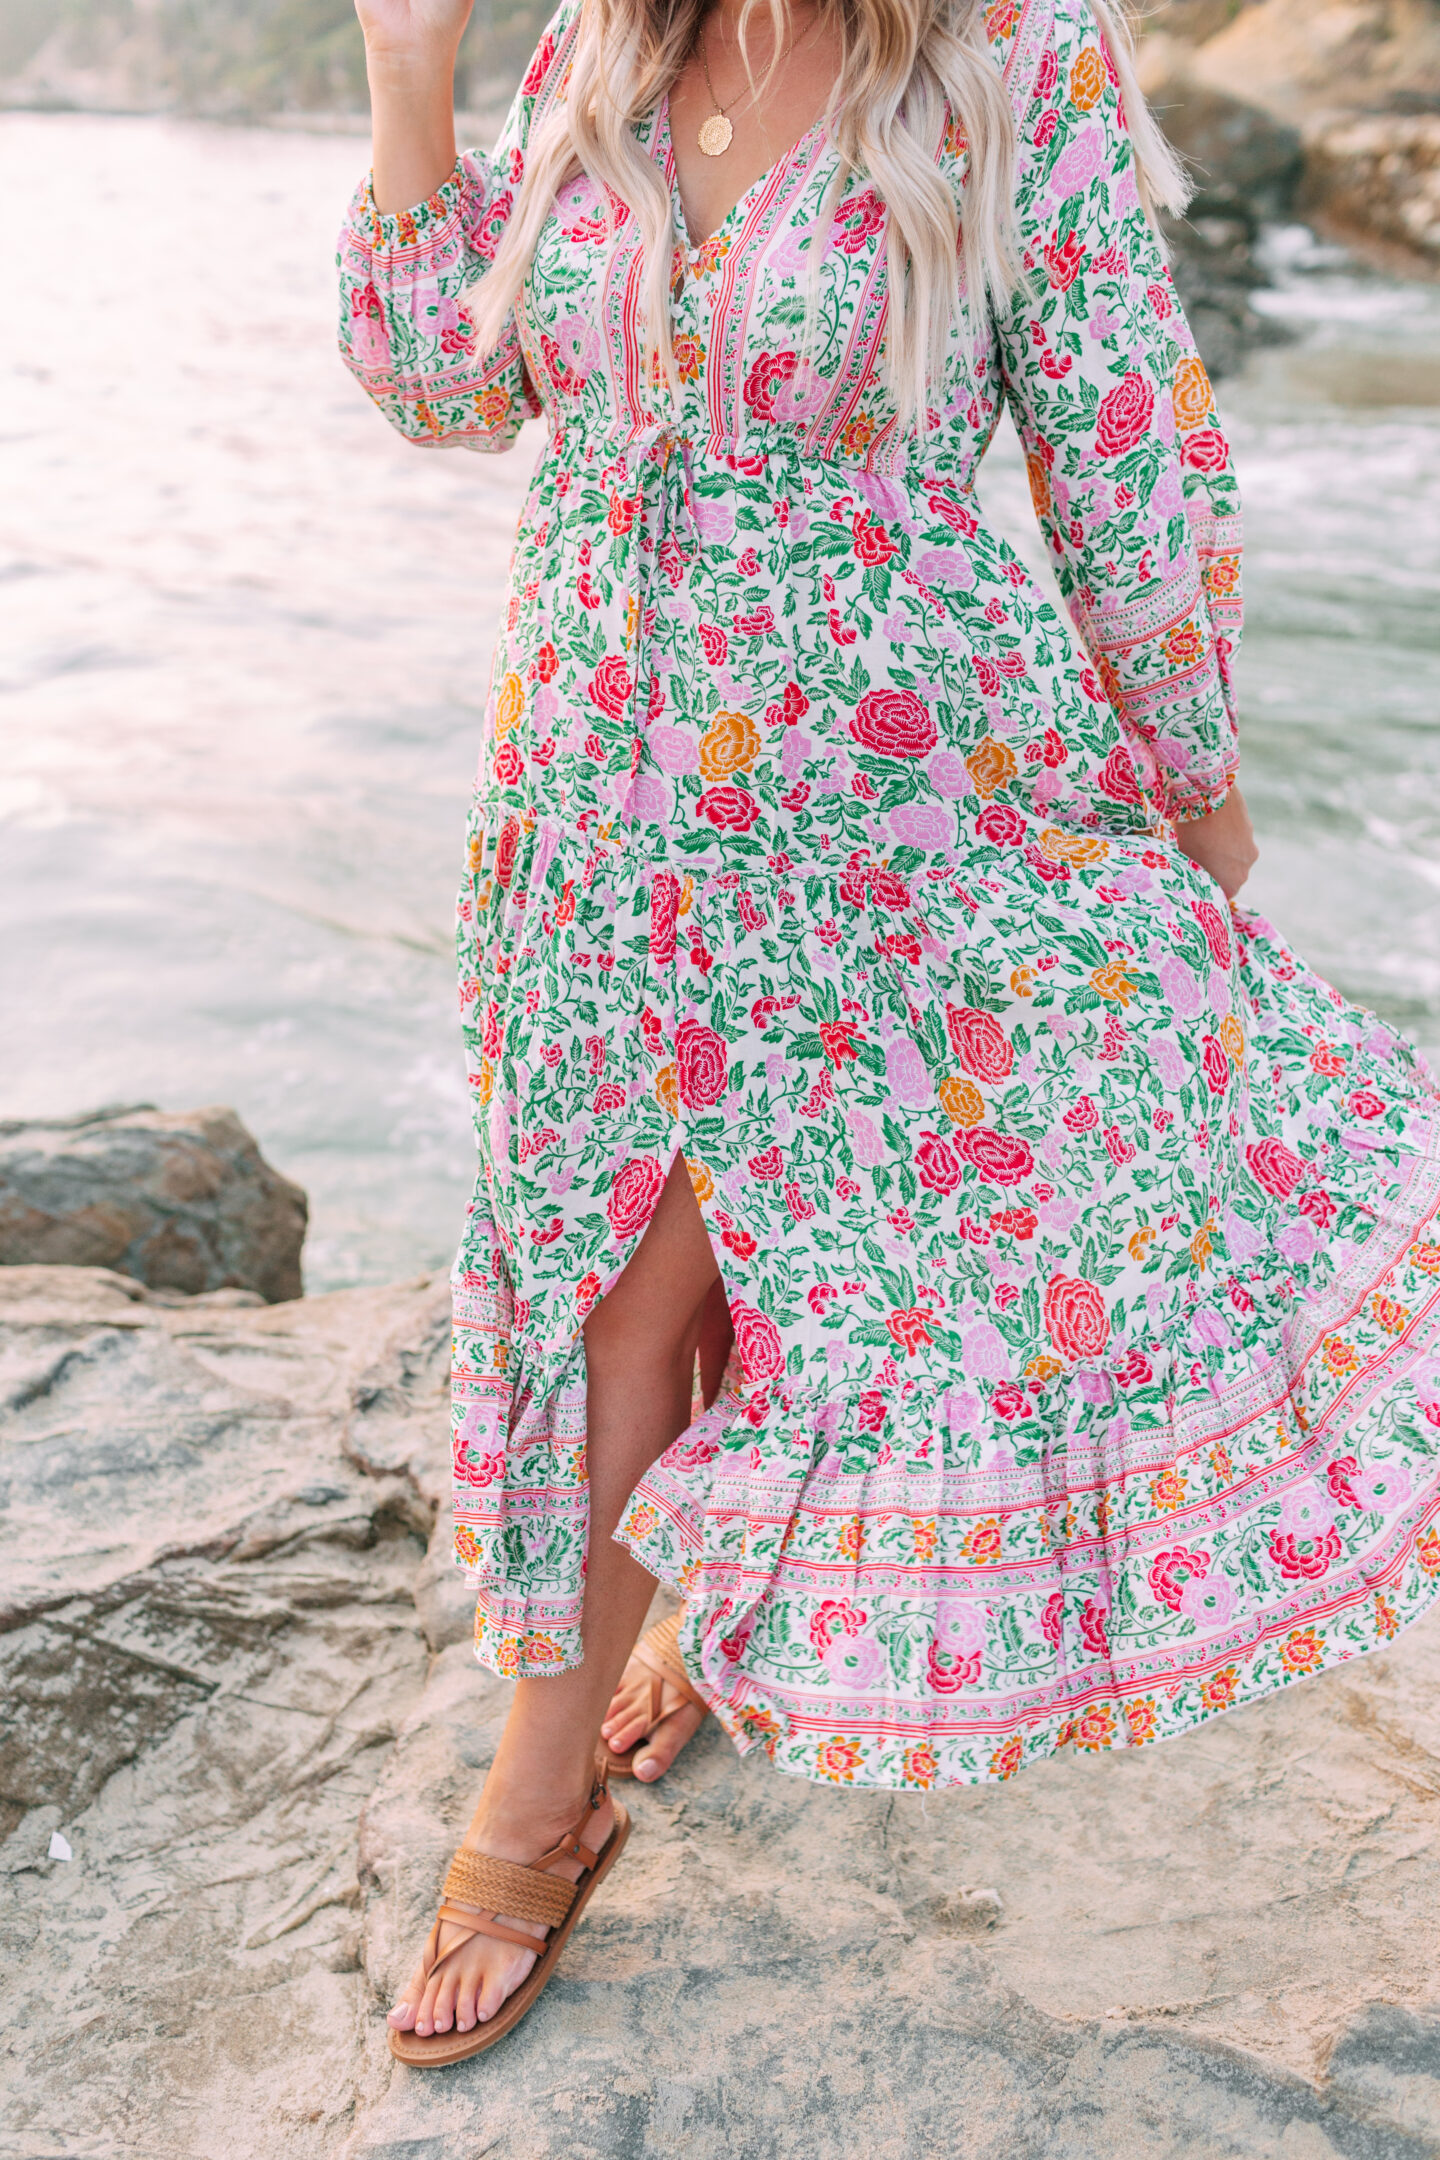 INTRODUCING: THE LAGUNA ADVENTURE DRESS